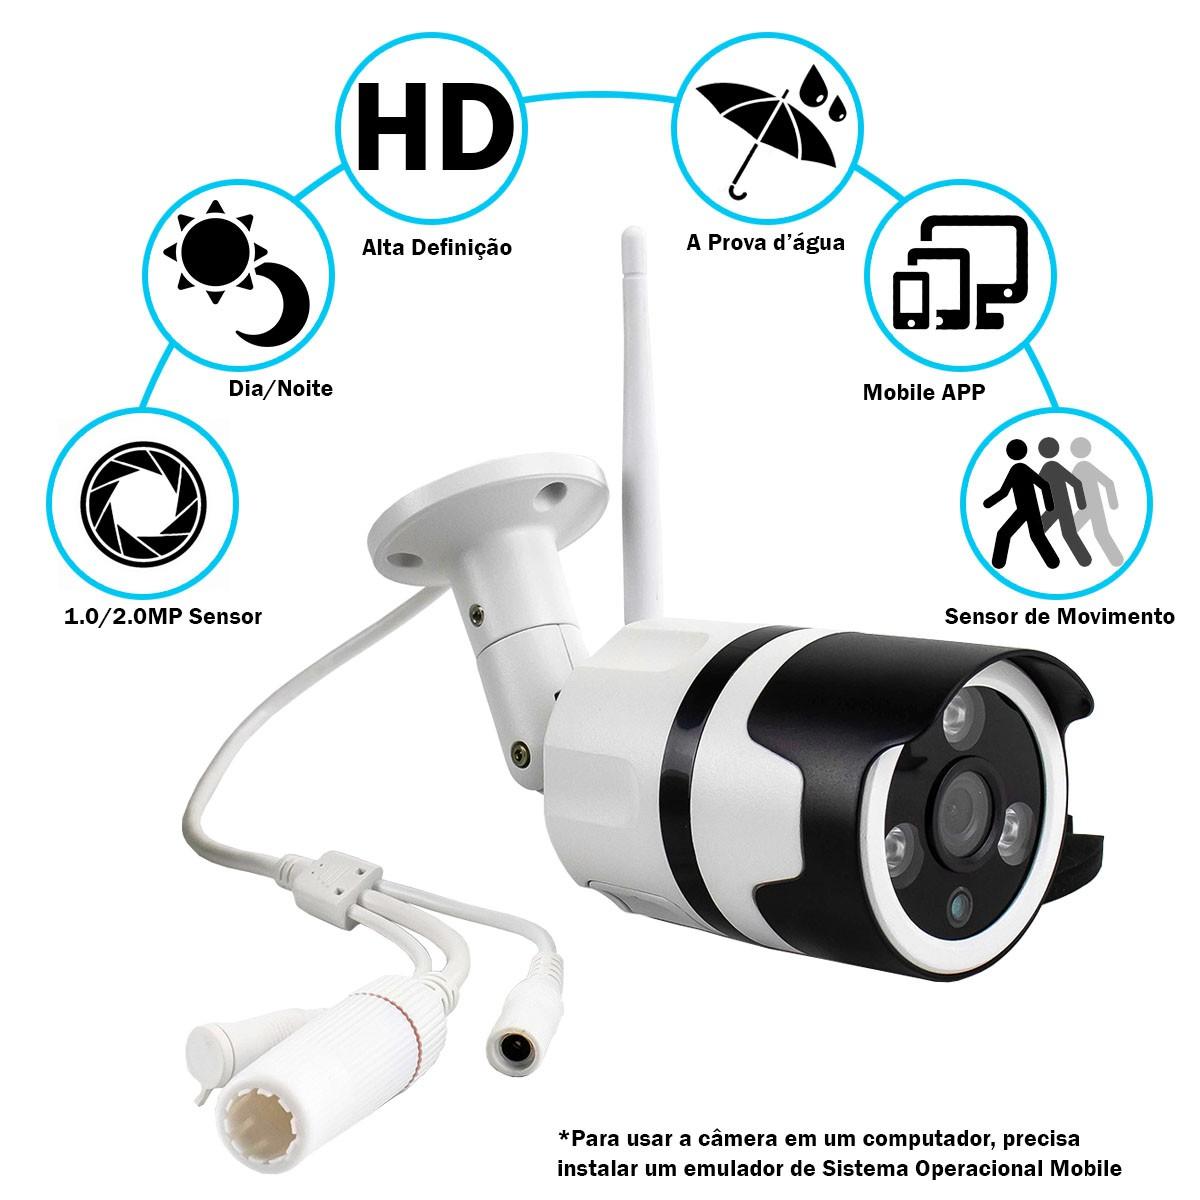 KIT 3x Câmera IP Digital Externa HD à Prova D'água com Visão Noturna 1920x1080 1.8MP-1F 3.6mm Lente XA-N632